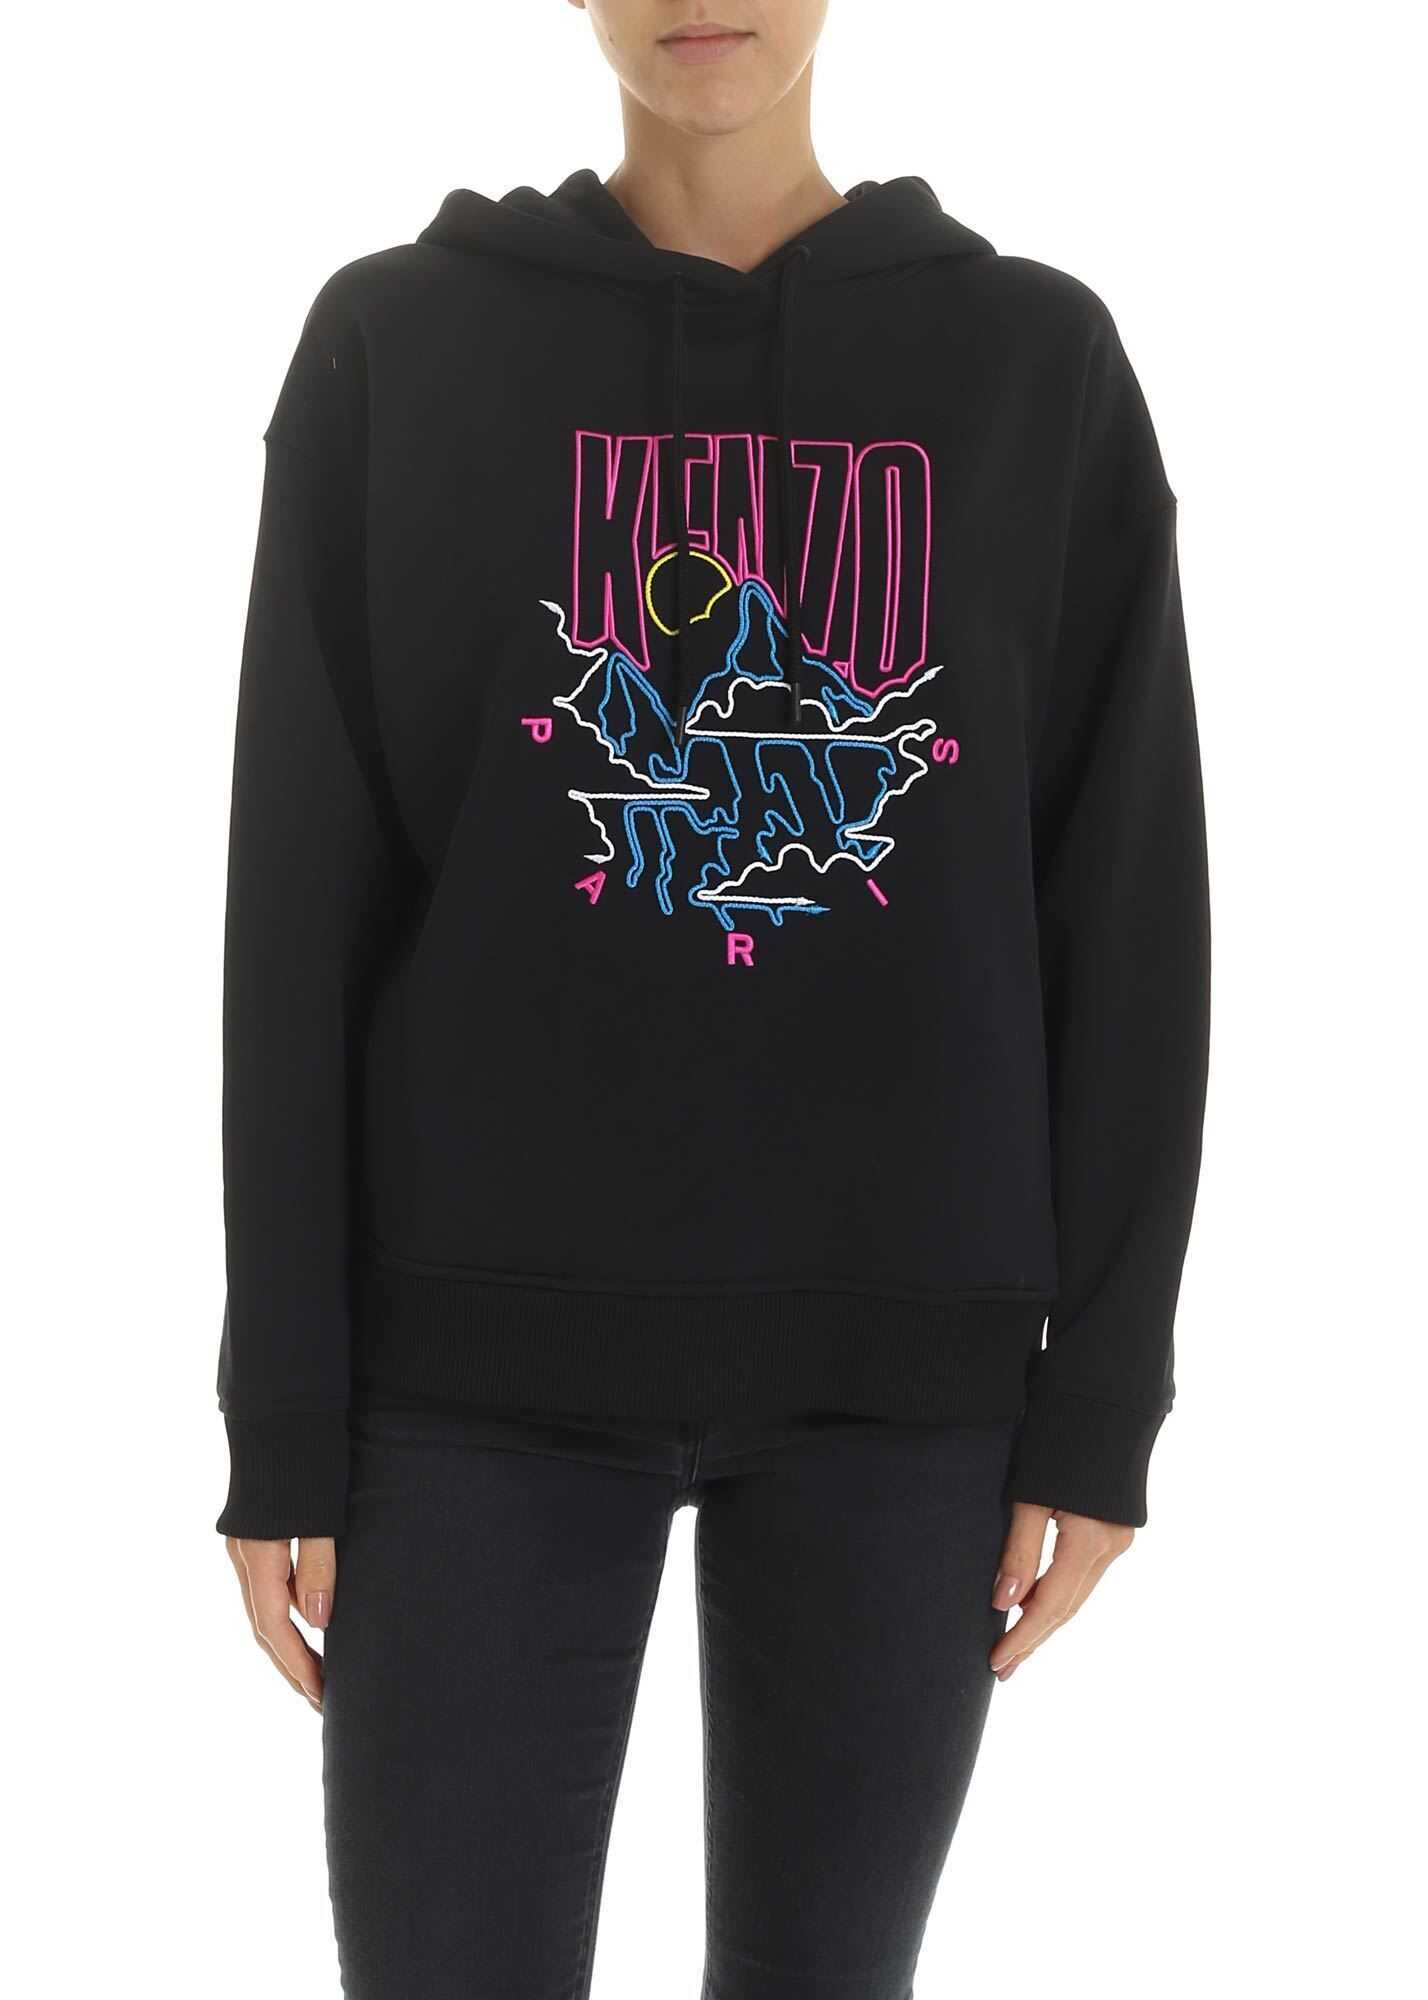 Kenzo Mountain Cords Sweatshirt In Black Black